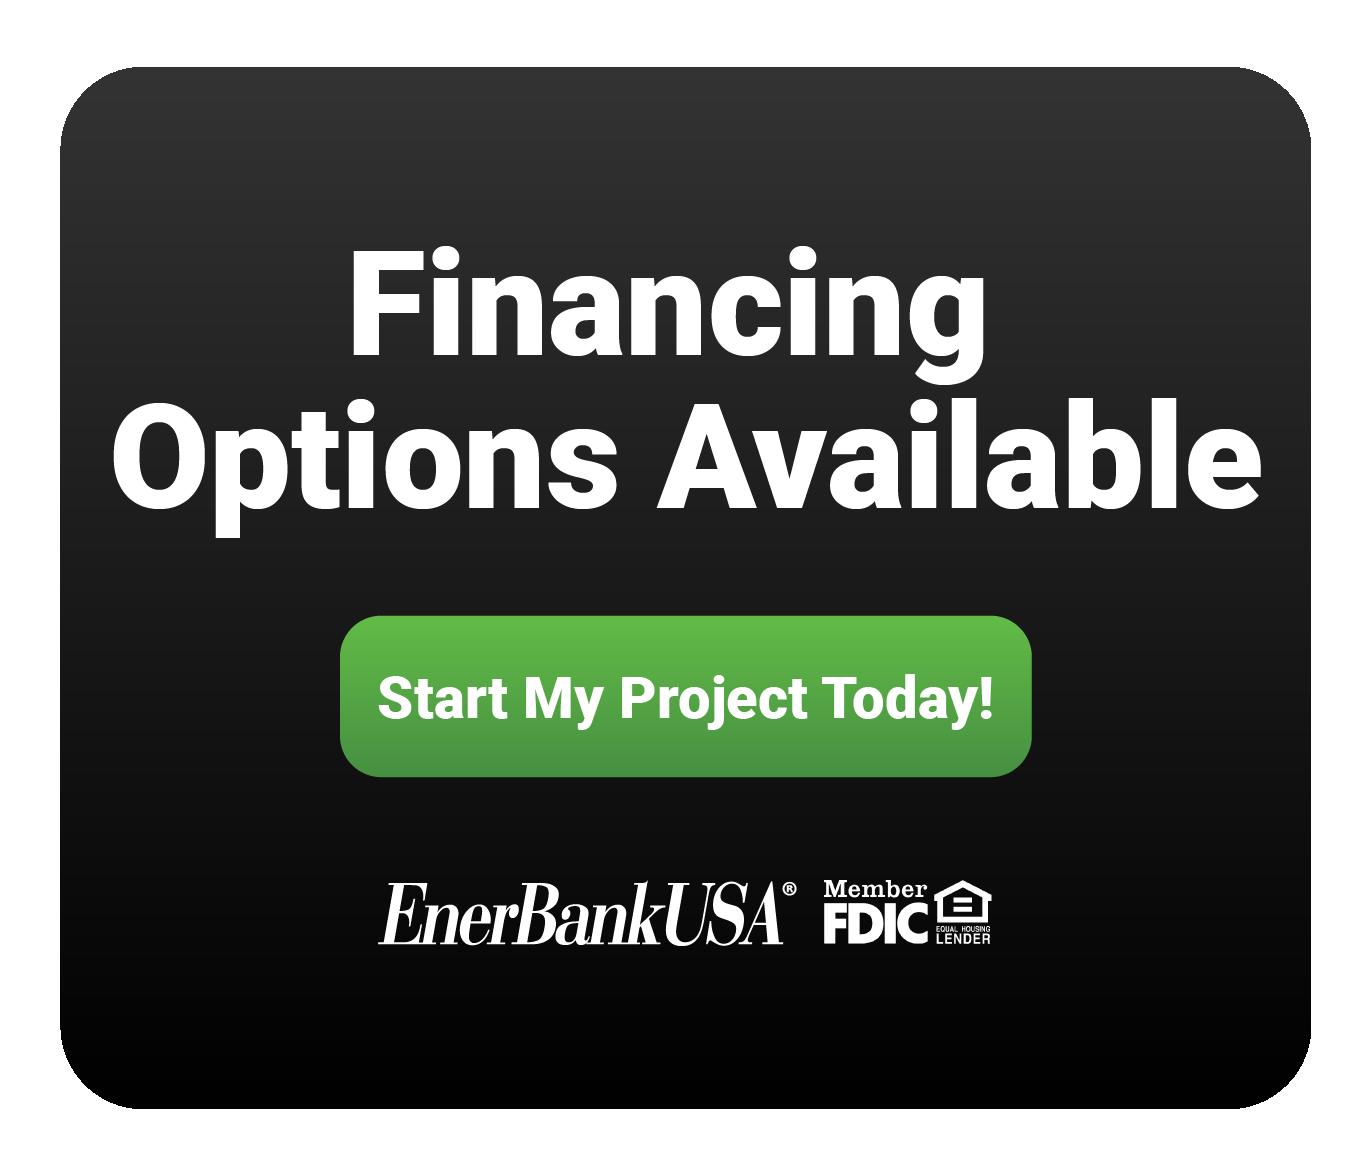 FinancingOptions Banners